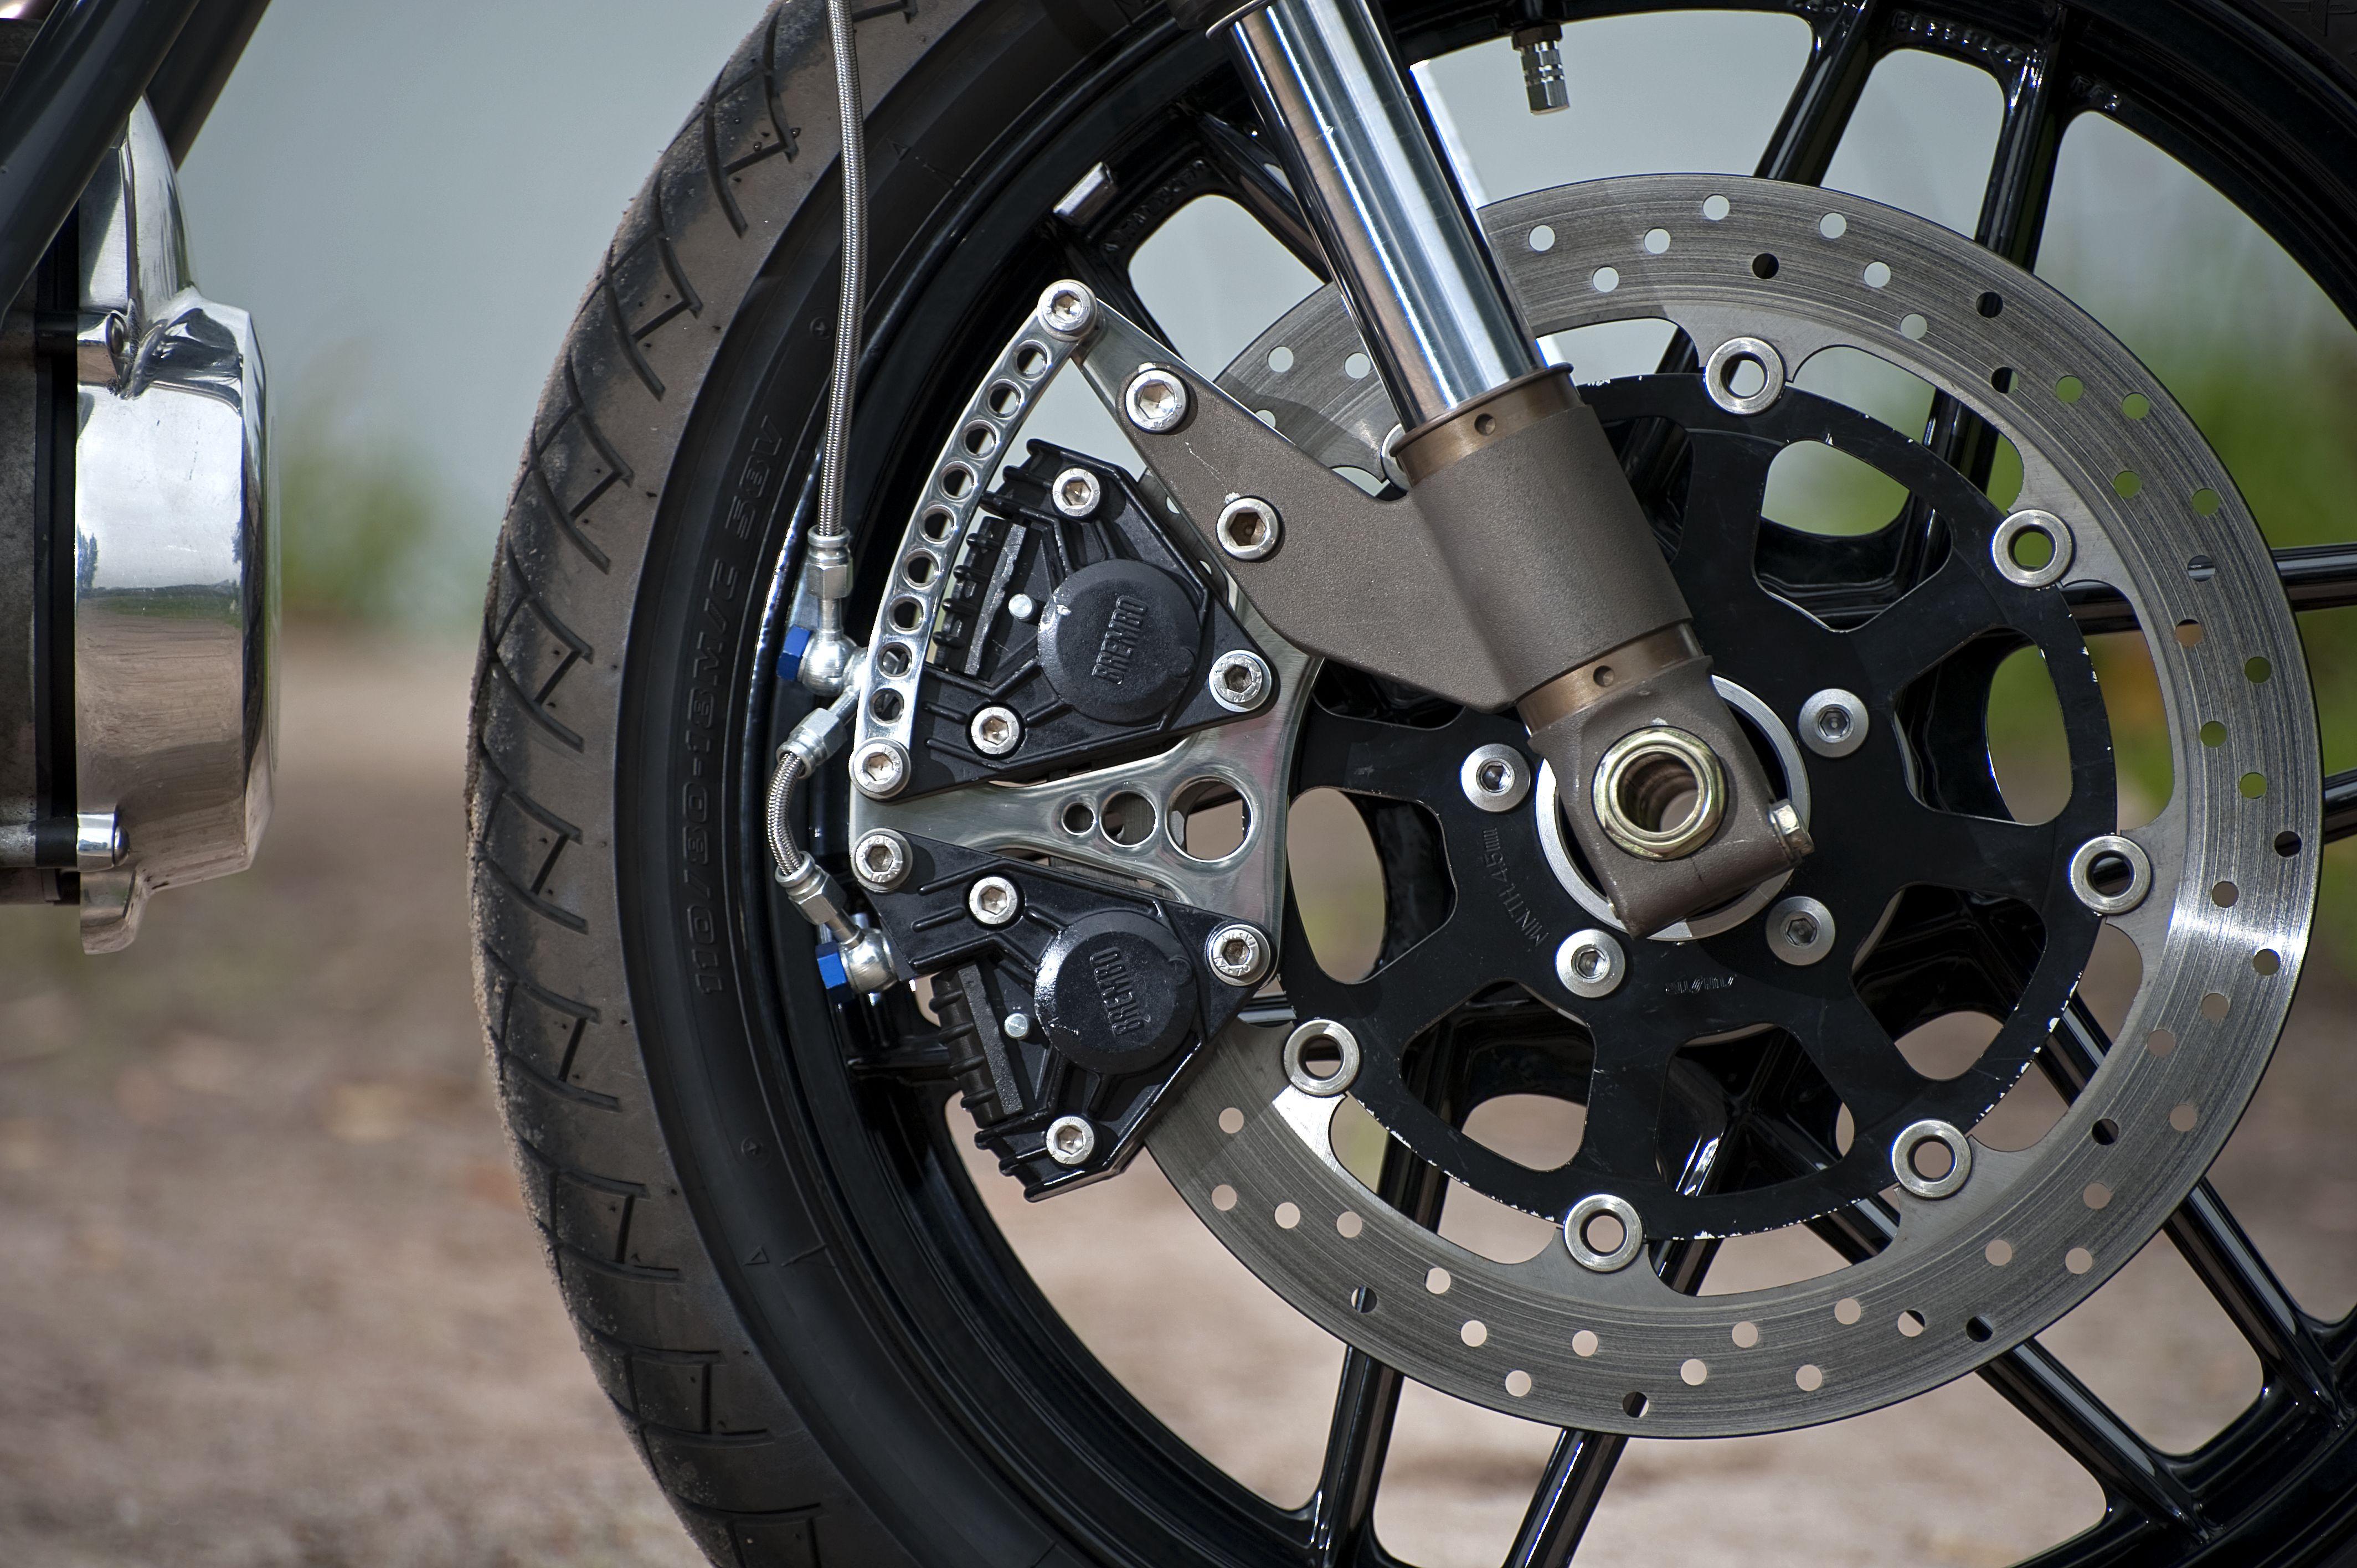 BratTracker front brake